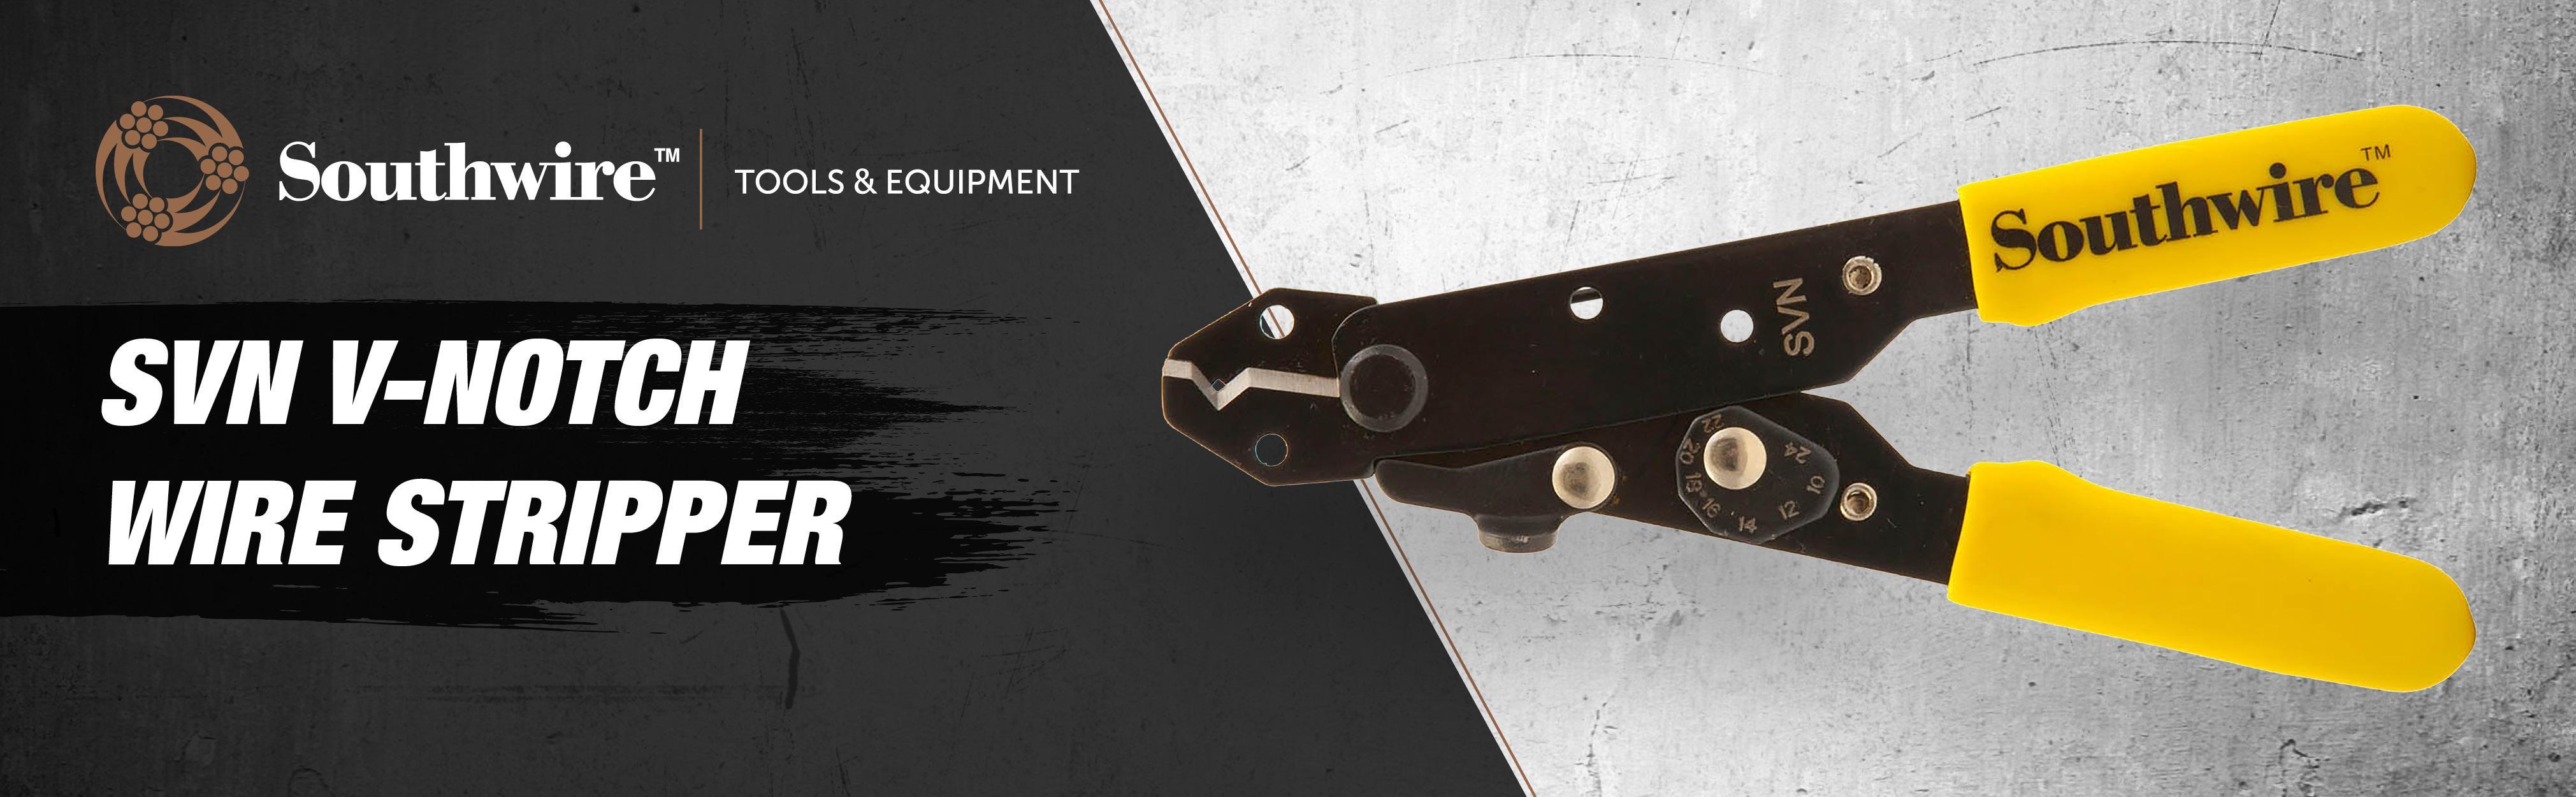 Southwire Tools & Equipment SVN V-Notch Wire Stripper - - Amazon.com